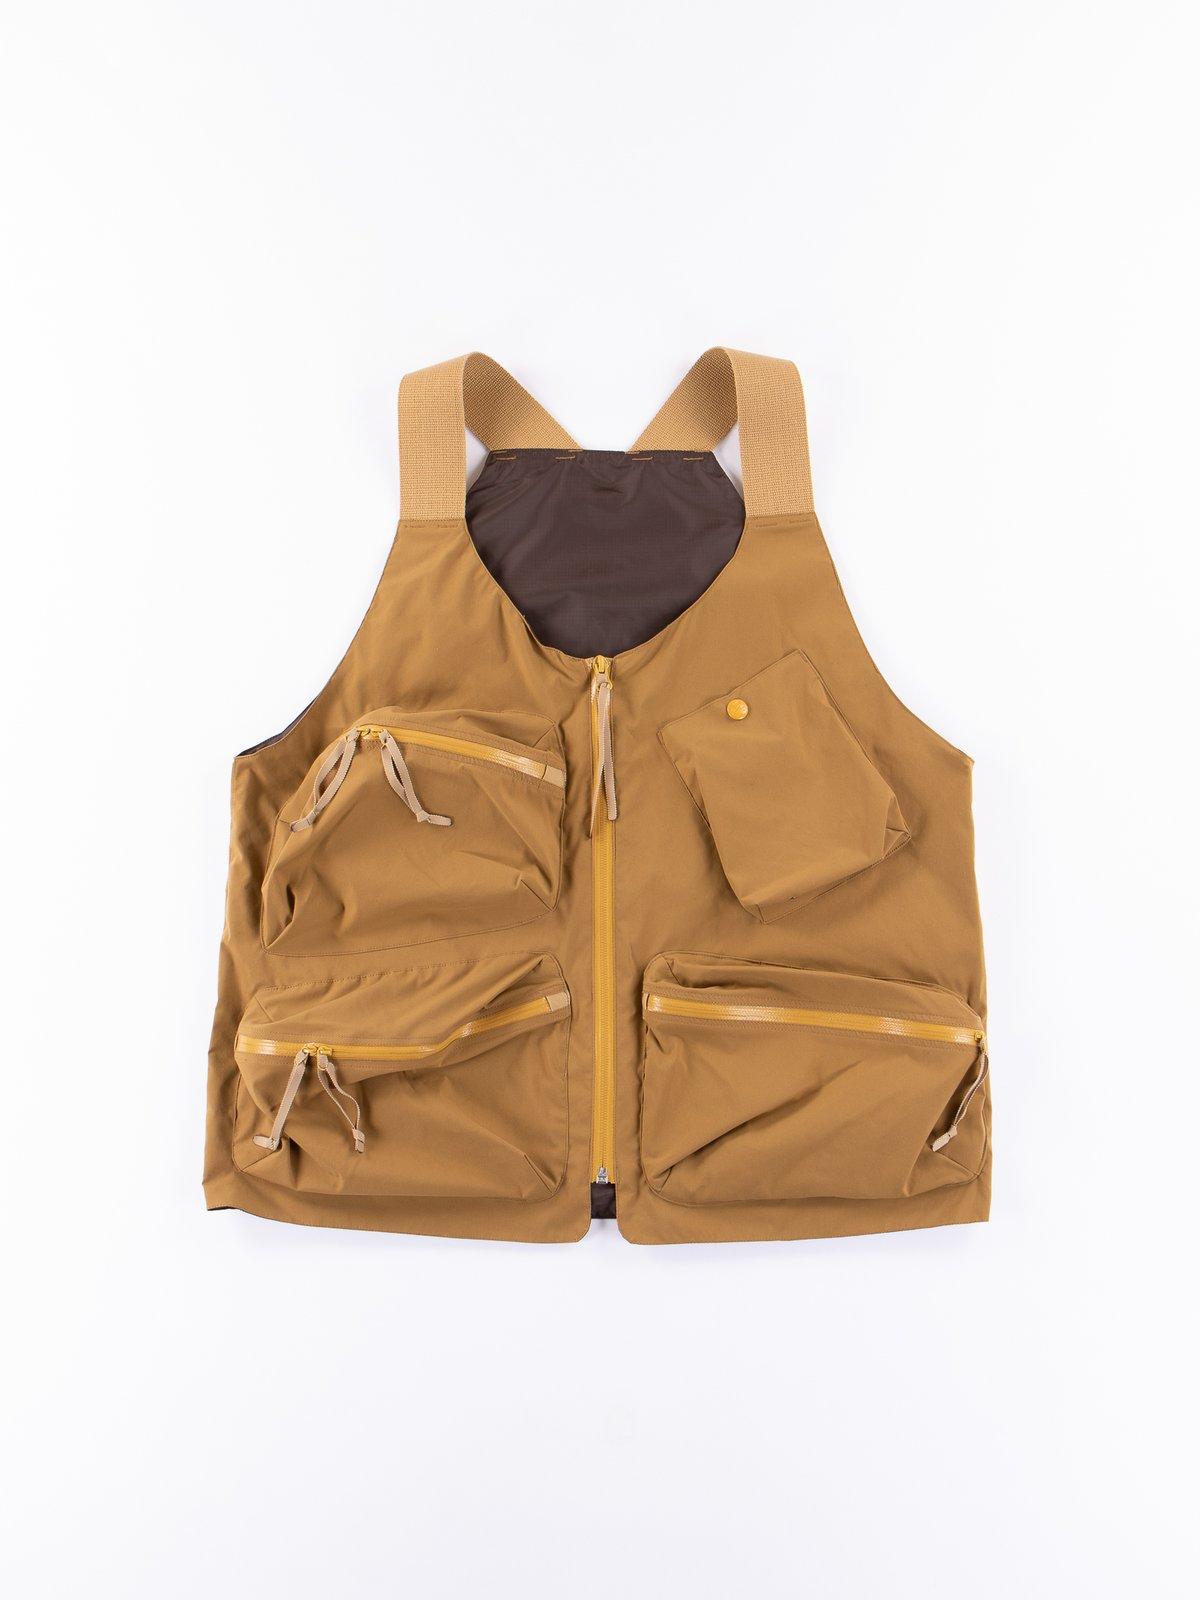 Coyote Huntish Mod Vest - Image 1